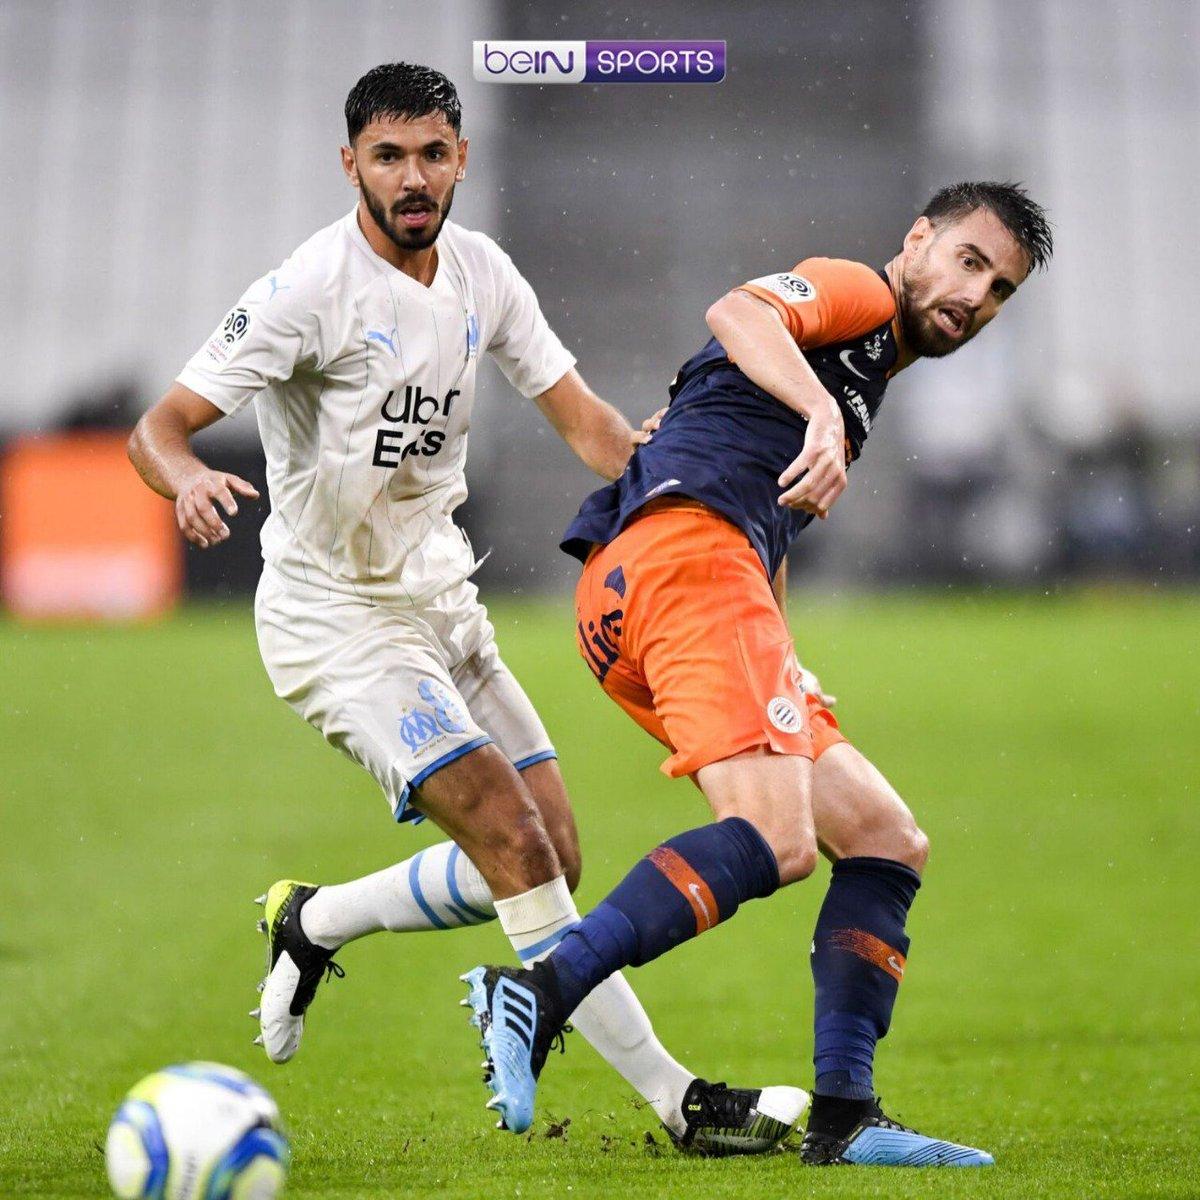 Galeri Keseruan @Ligue1Conforama semalam! 🇫🇷🔥.⚽ Marseille 1 - 1 Montpellier⚽ Bordeaux 2-2 Brest⚽ Metz 1 - 2 Amiens⚽ Nice 2 - 1 Dijon⚽ Nimes 1 - 0 Toulouse⚽ Reims 0 - 0 Monaco.#beINLigue1 #Ligue1